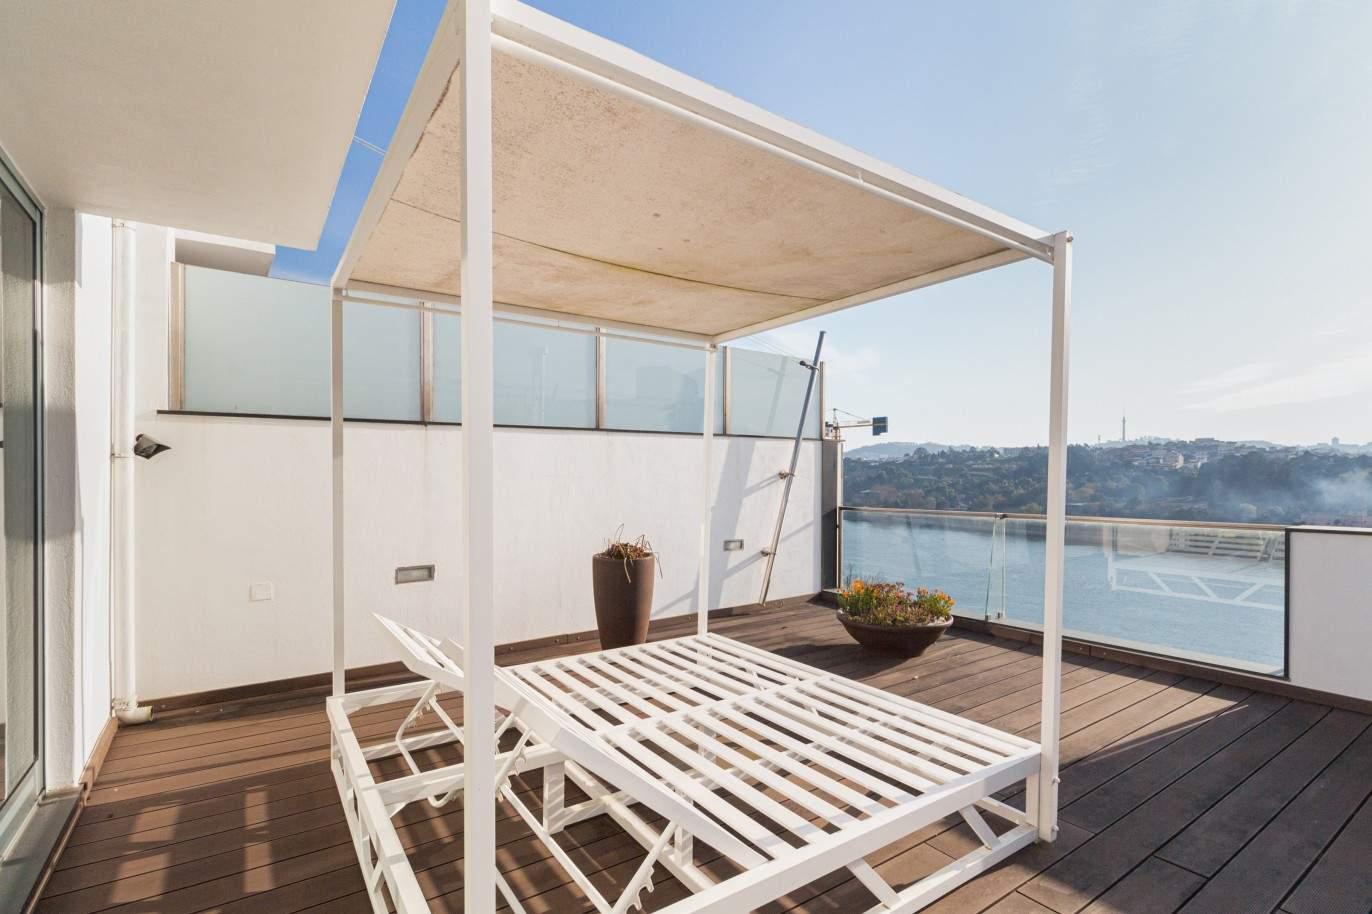 luxury-villa-with-river-views-for-sale-in-valbom-porto-portugal